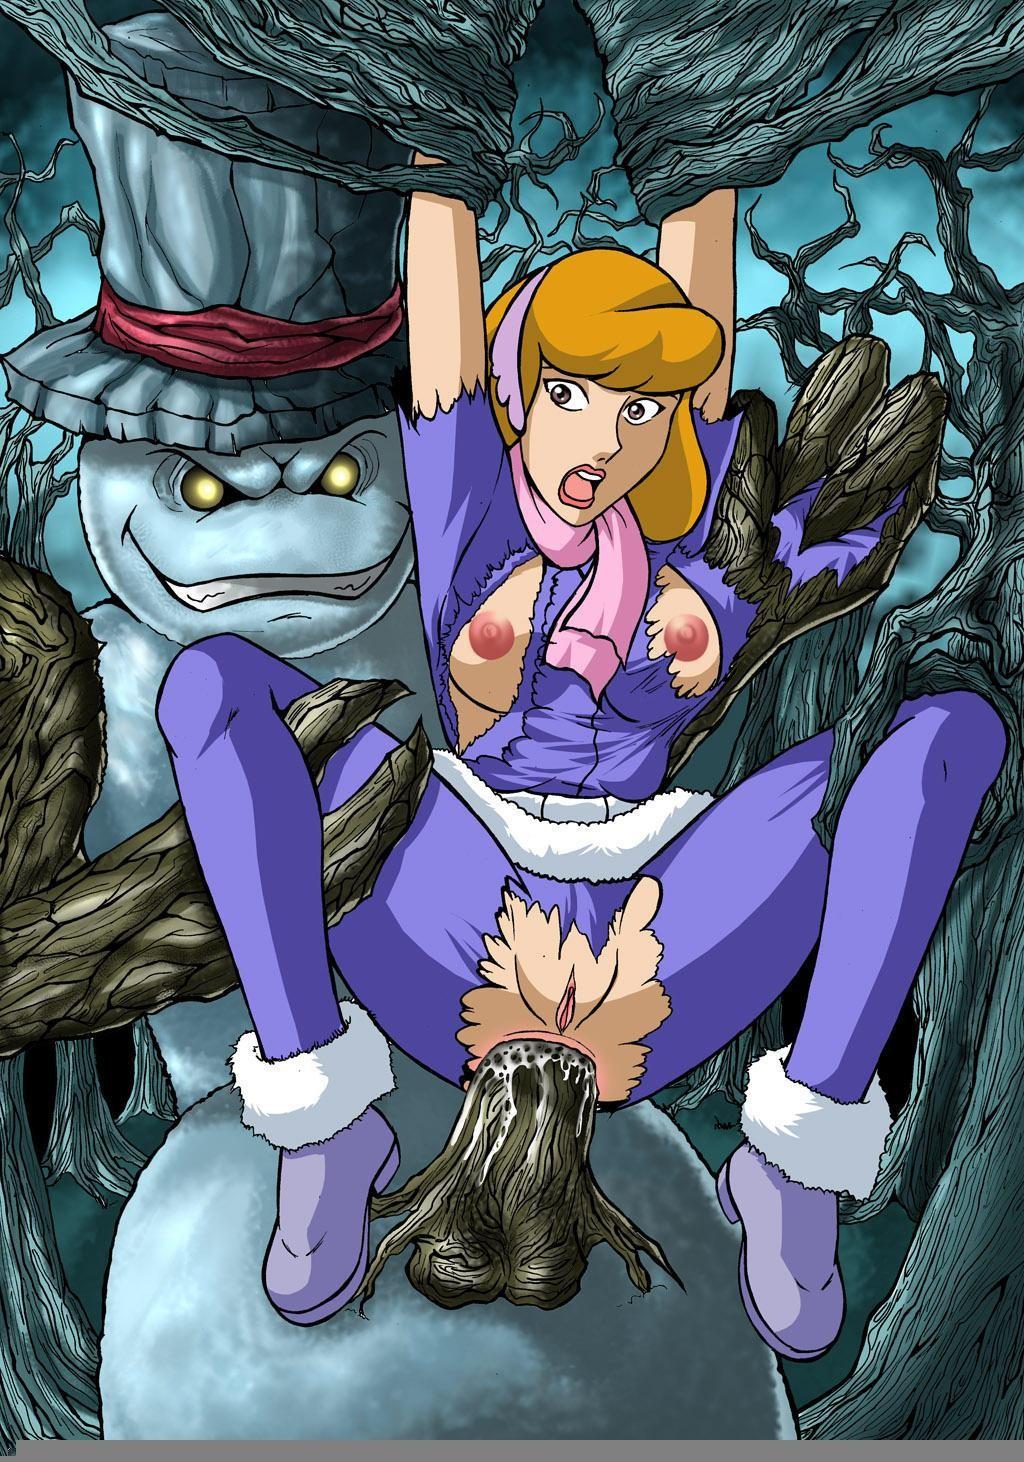 Daphne gets fucked by frankenstein's monster